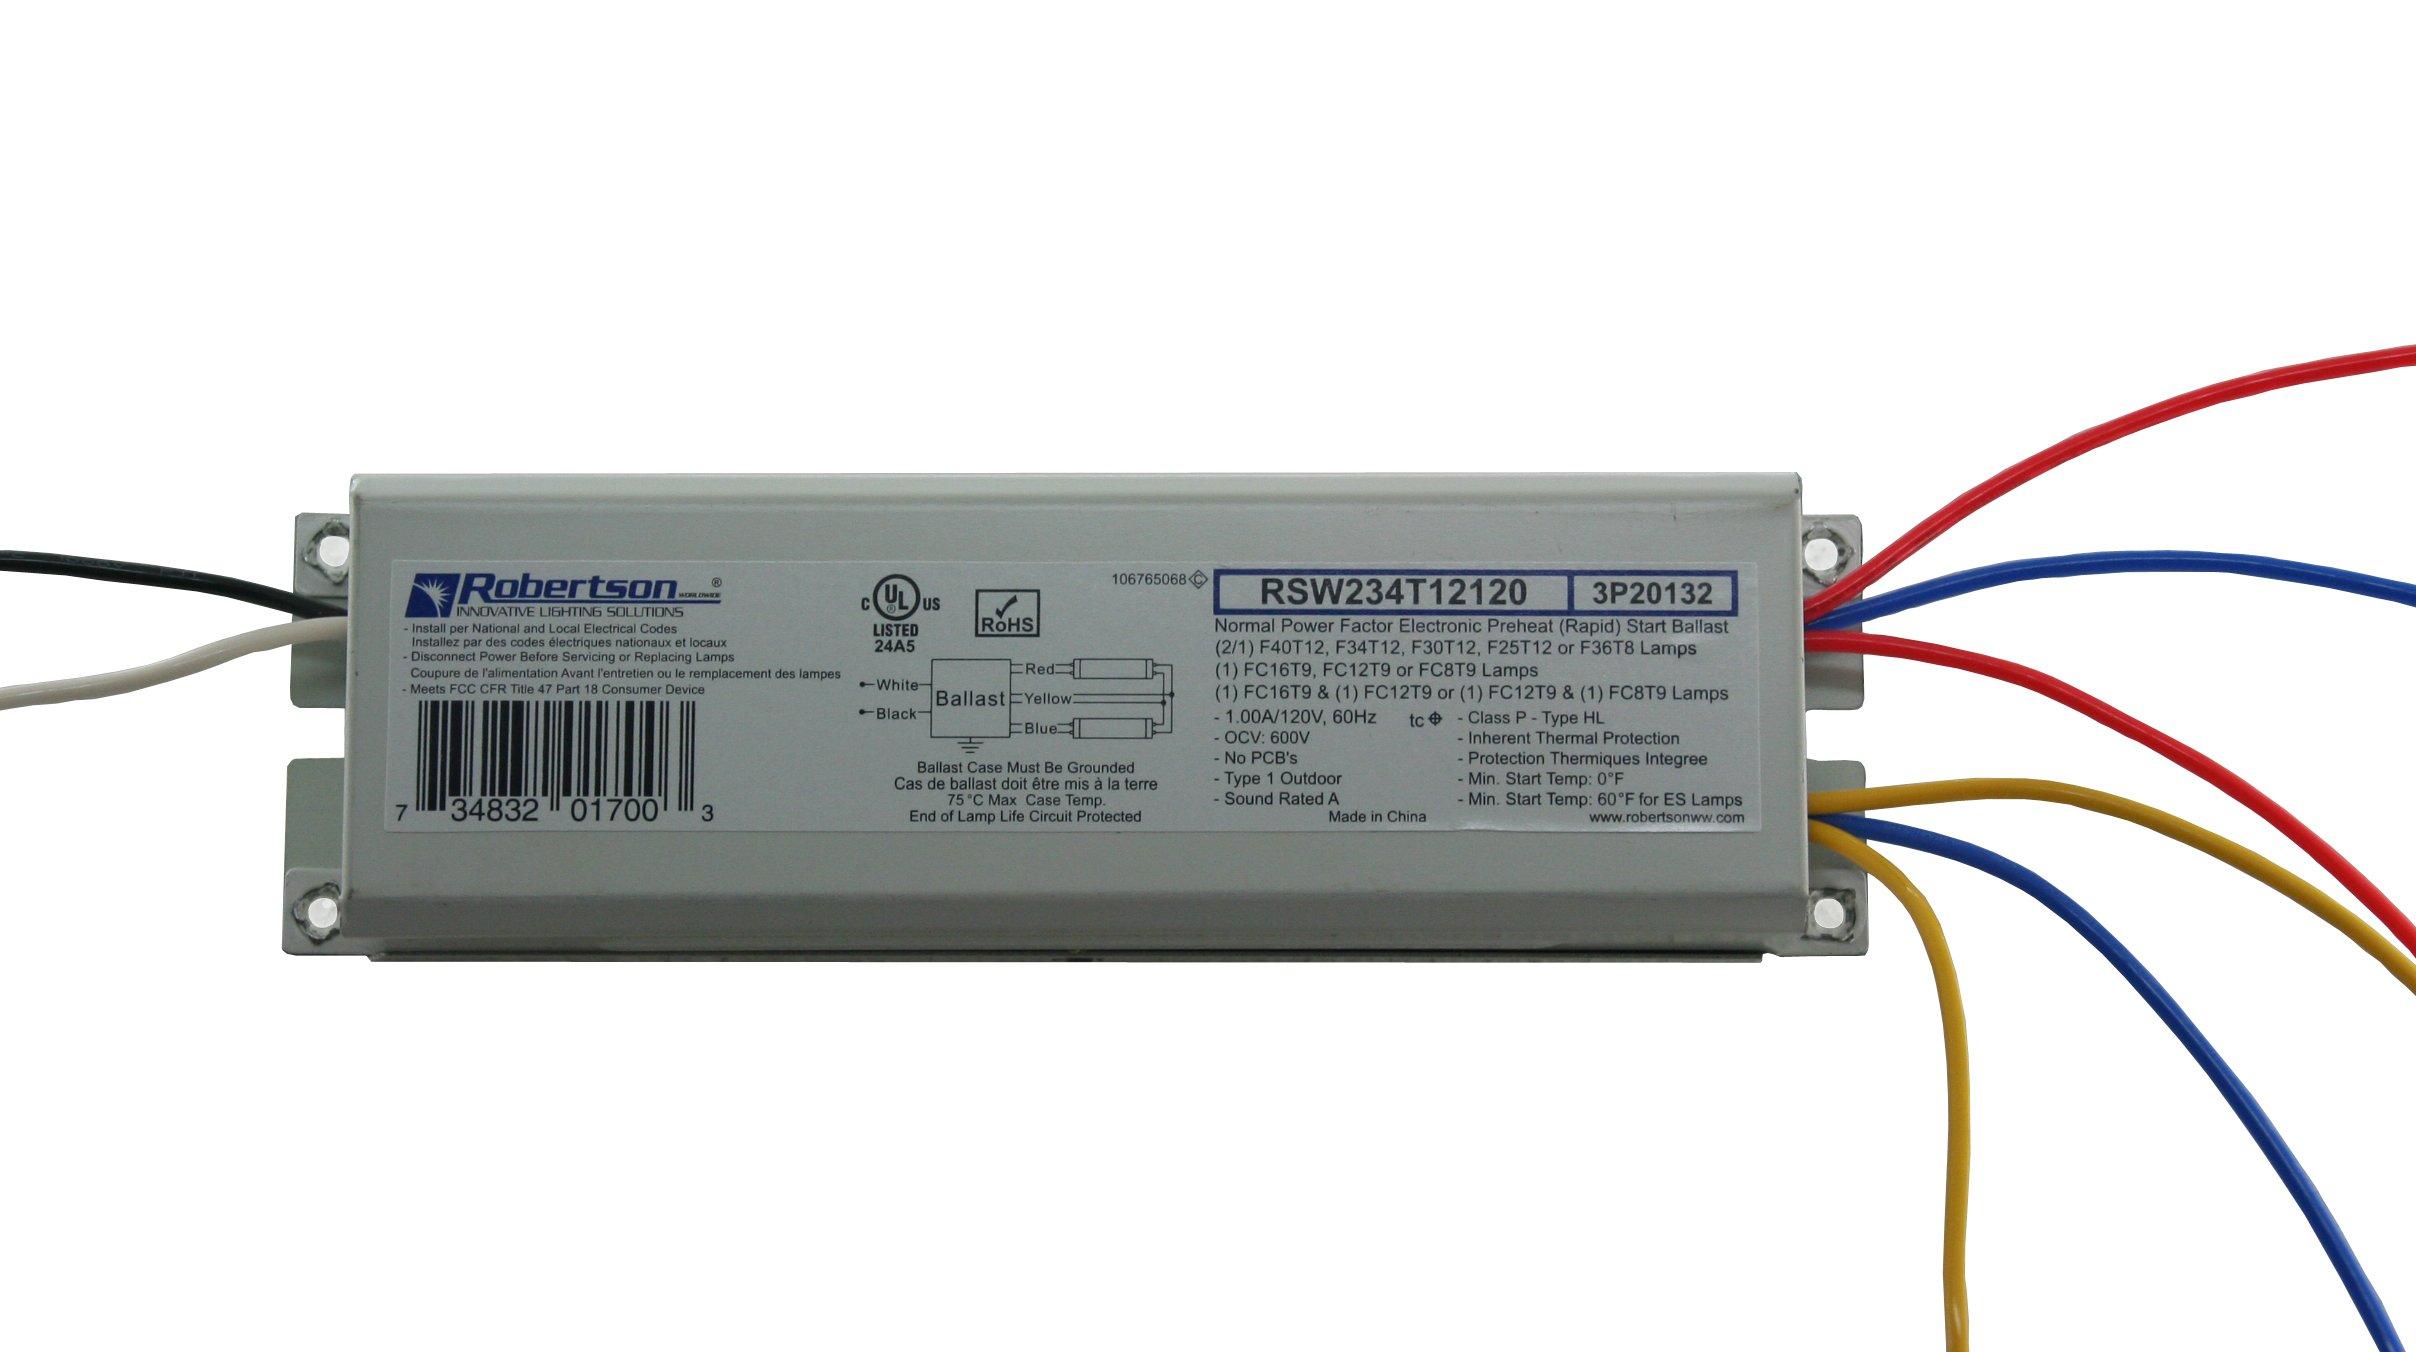 ROBERTSON 3P20132 Fluorescent eBallast for 2 F40T12 Linear Lamps, Preheat- Rapid Start, 120Vac, 50-60Hz, Normal Ballast Factor, NPF, Model RSW234T12120/A (Crosses to 3P20010 Model RSW240T12120/B)